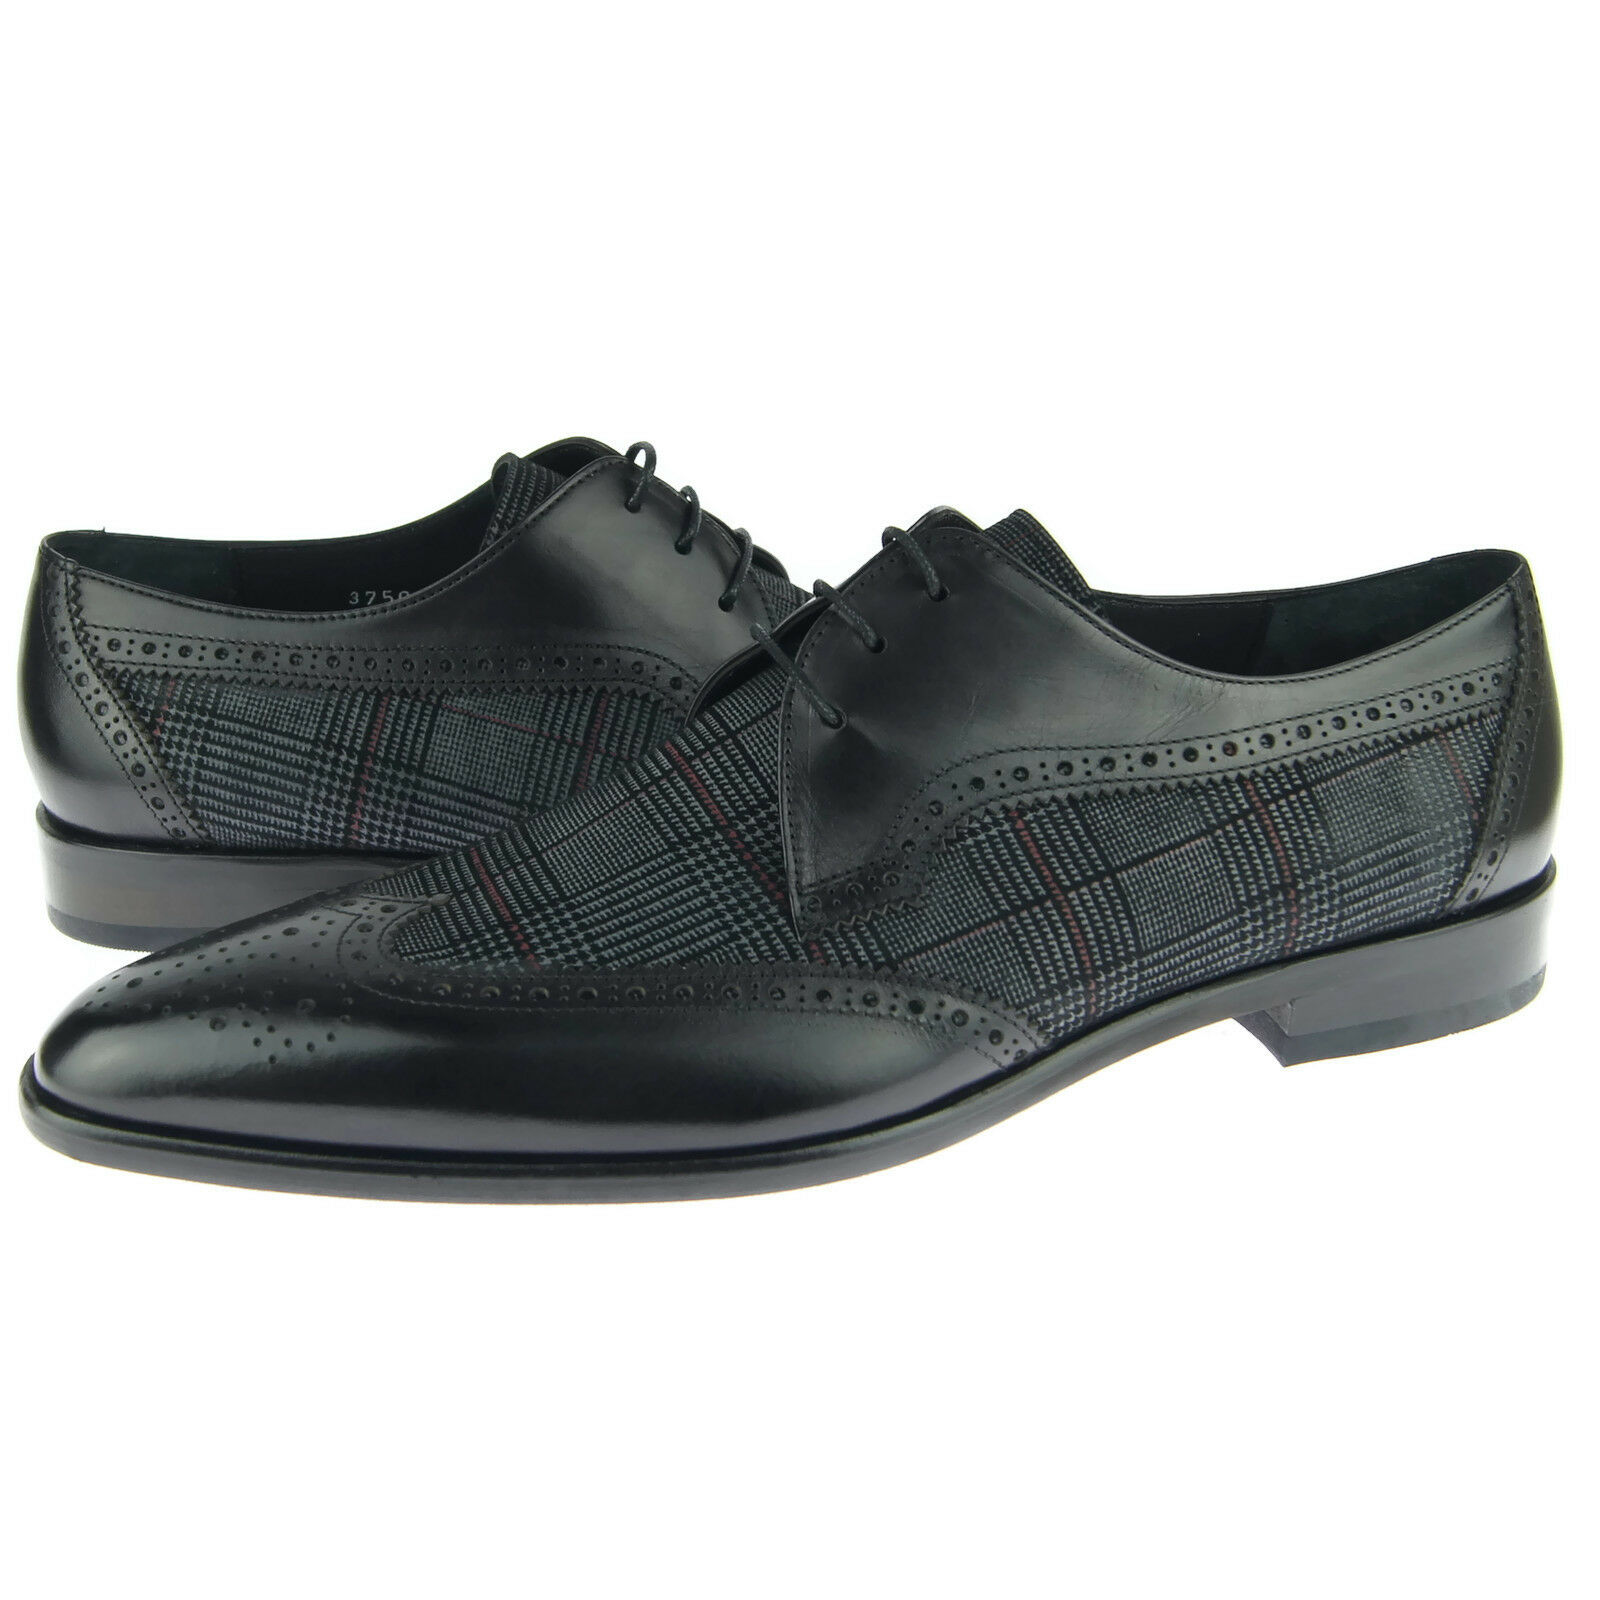 Corrente 3750 Wingtip Derby, Men's Dress Leather Oxford scarpe, nero